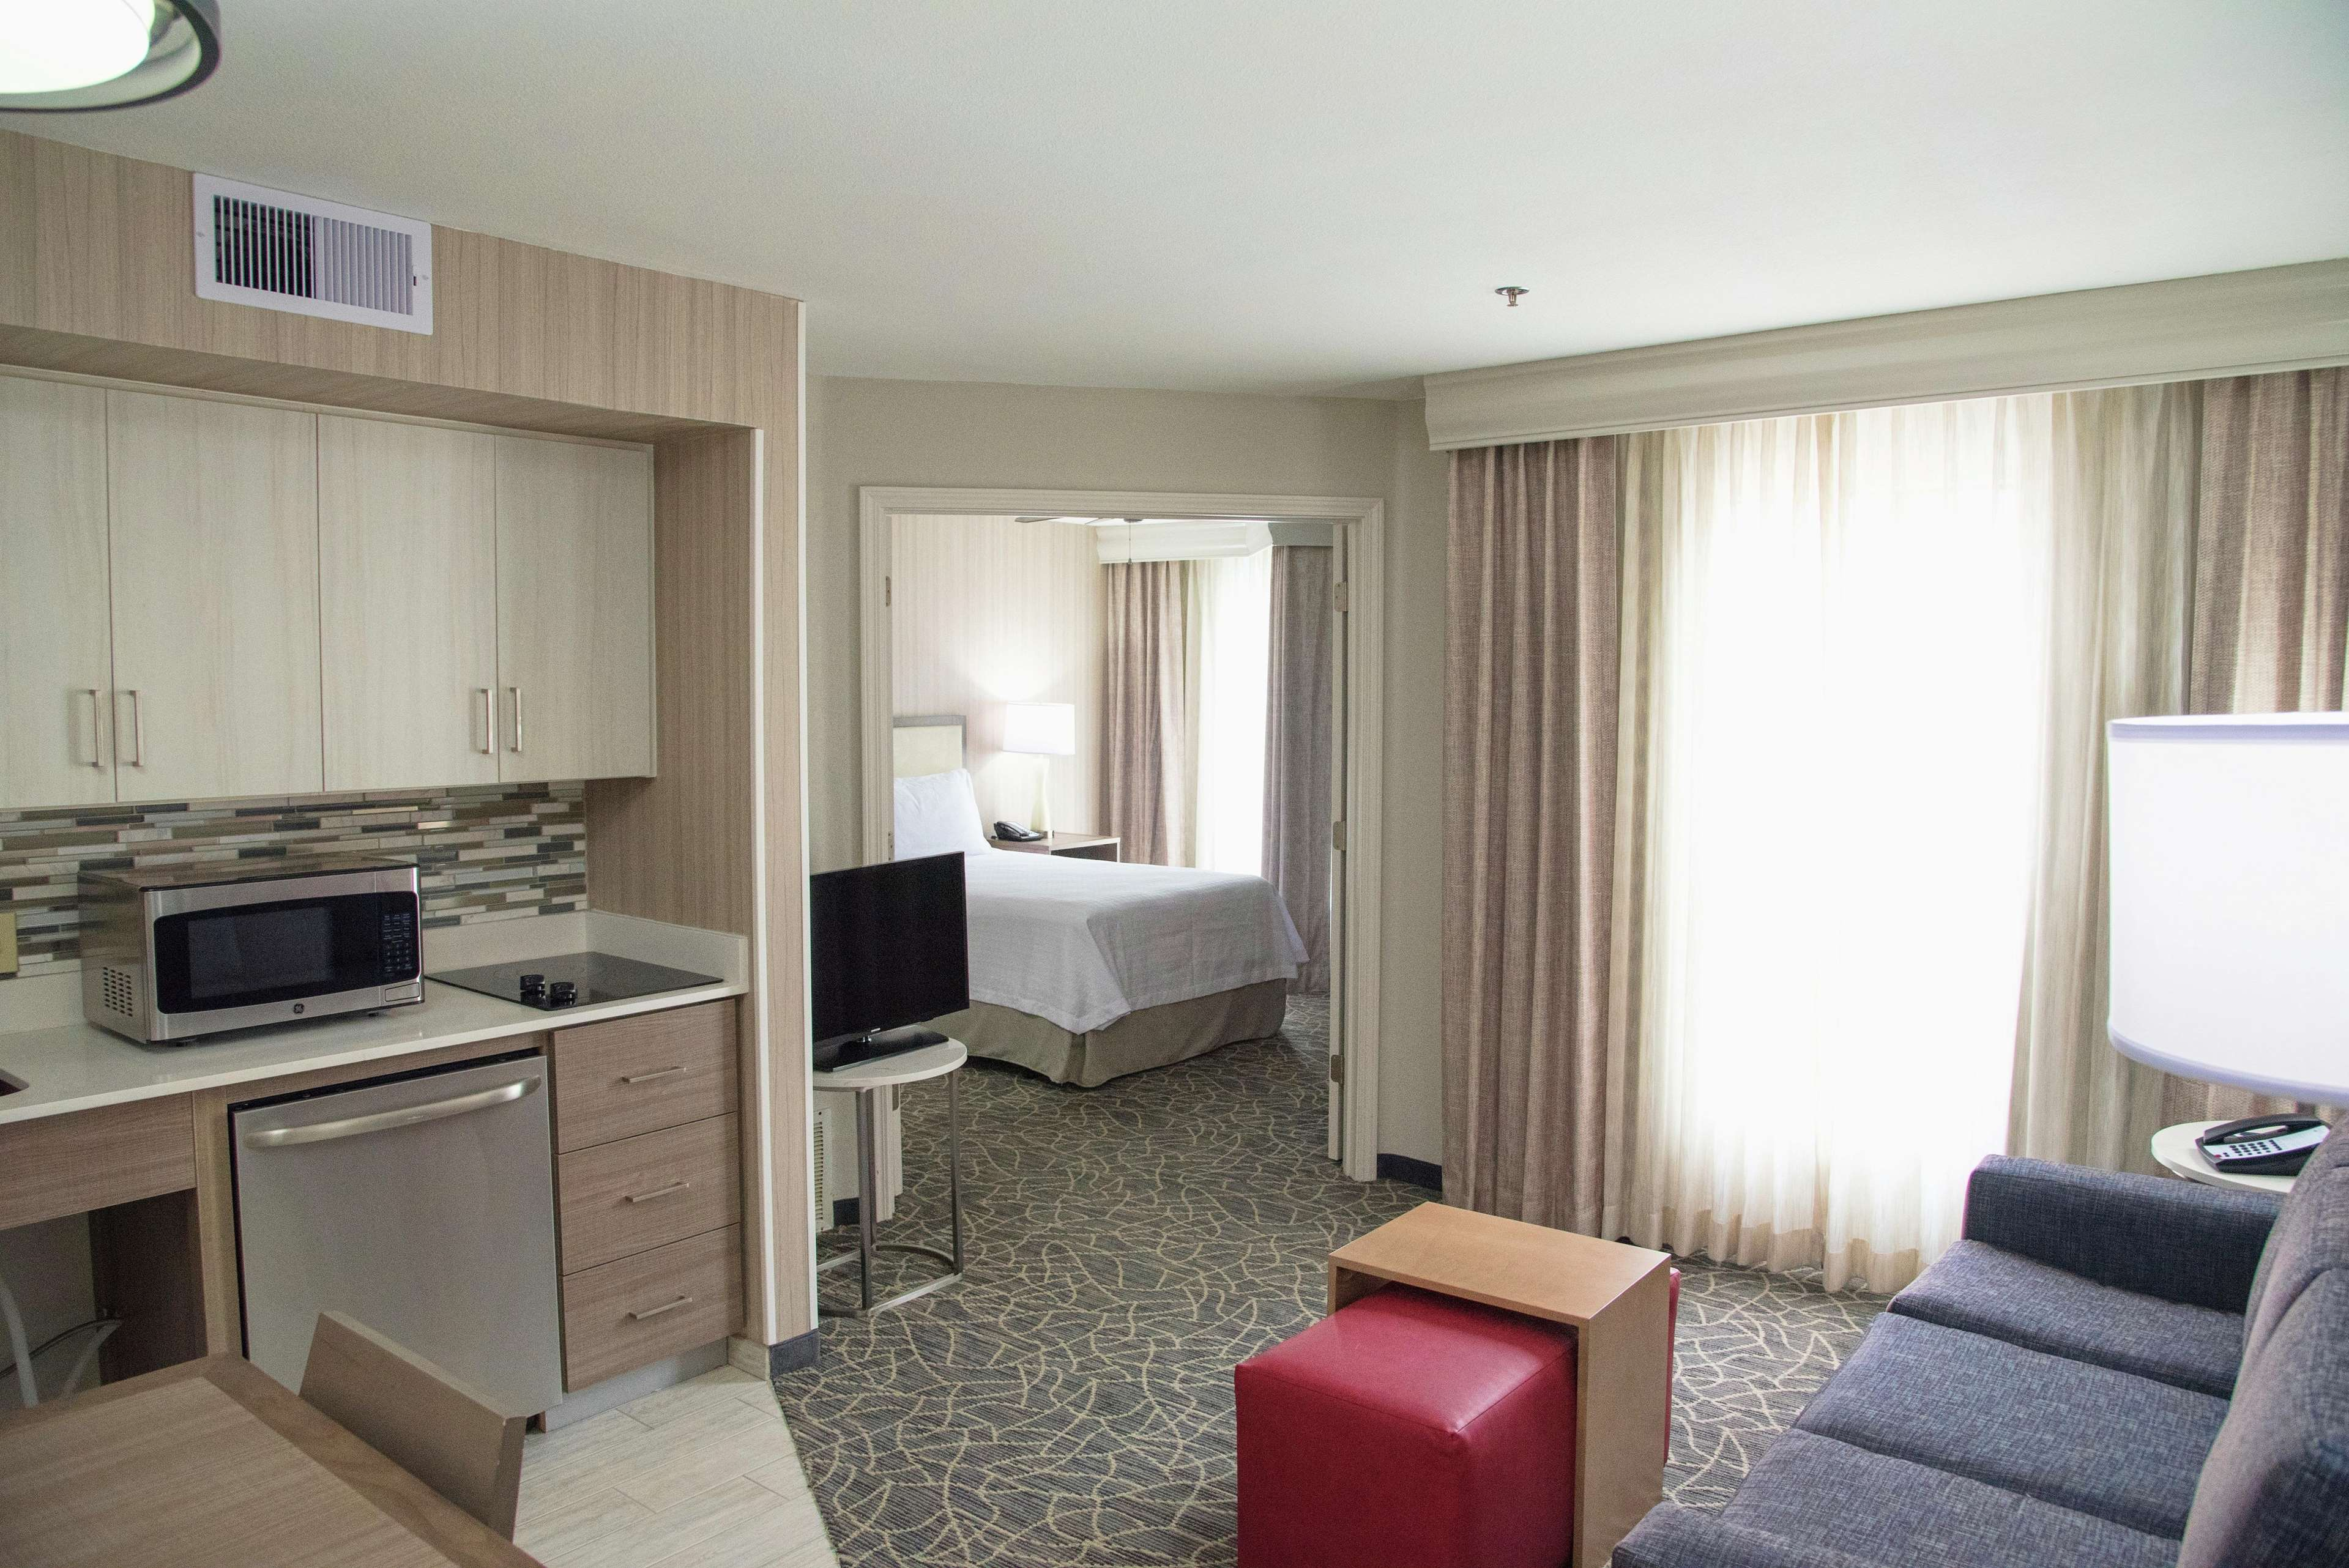 Homewood Suites by Hilton Atlanta-Peachtree Corners/Norcross